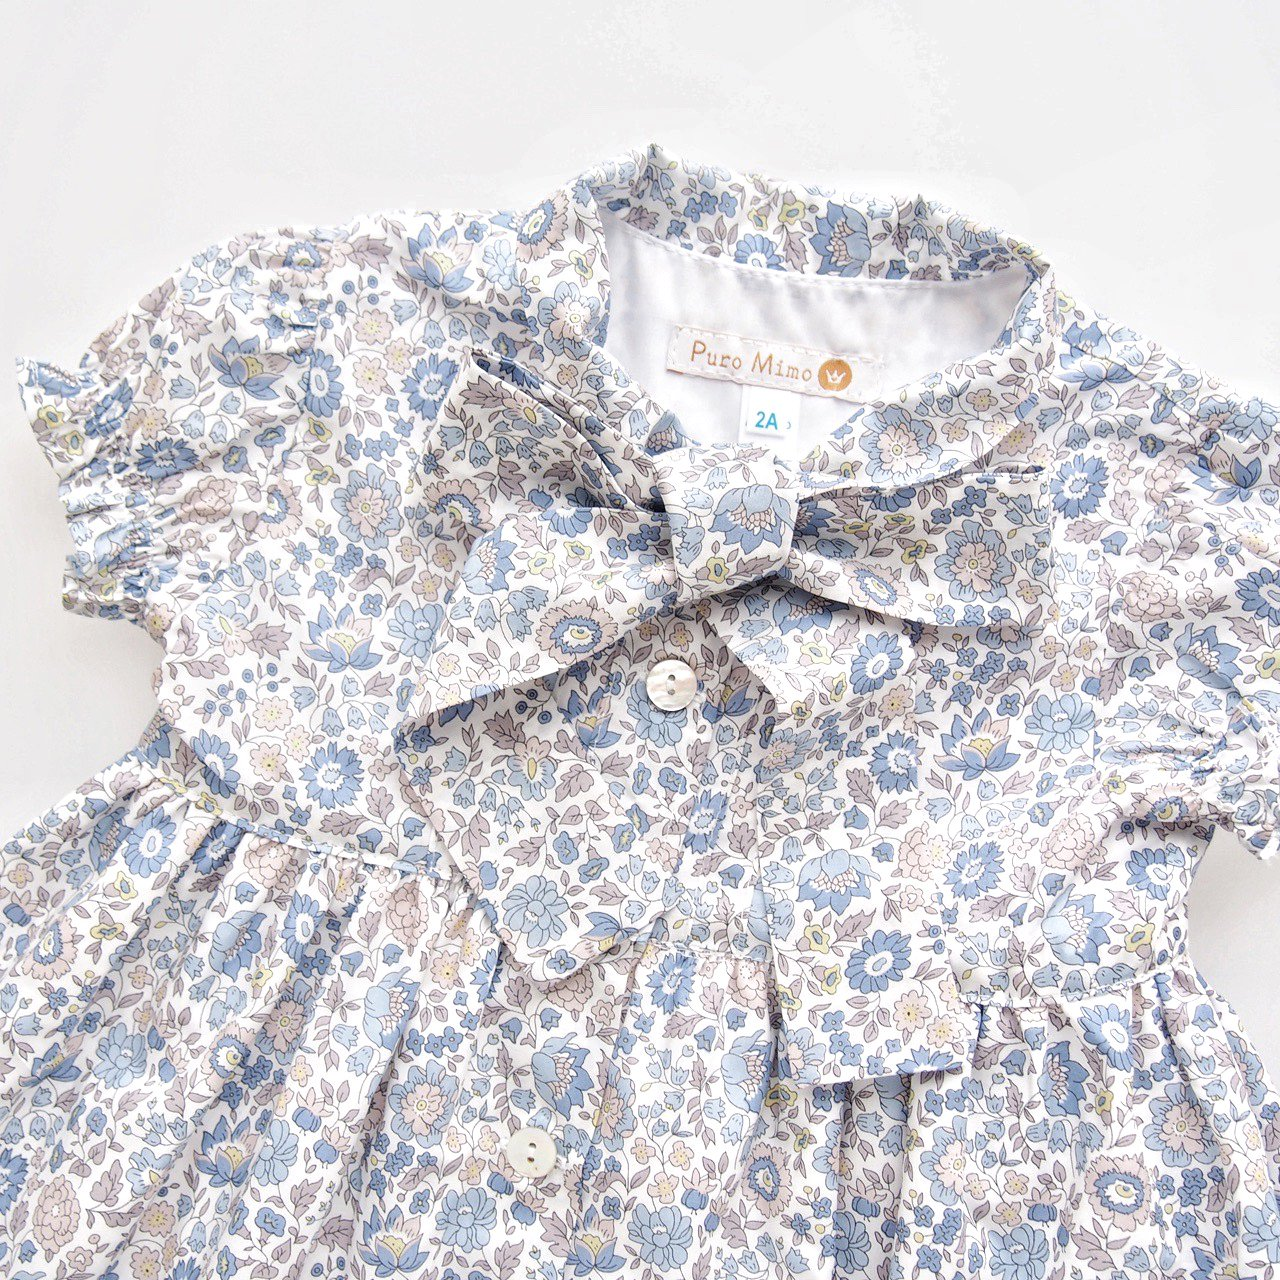 <img class='new_mark_img1' src='https://img.shop-pro.jp/img/new/icons1.gif' style='border:none;display:inline;margin:0px;padding:0px;width:auto;' />San Sakae Petit × Puro Mimo - Bow tie dress (Liberty D'anjo)